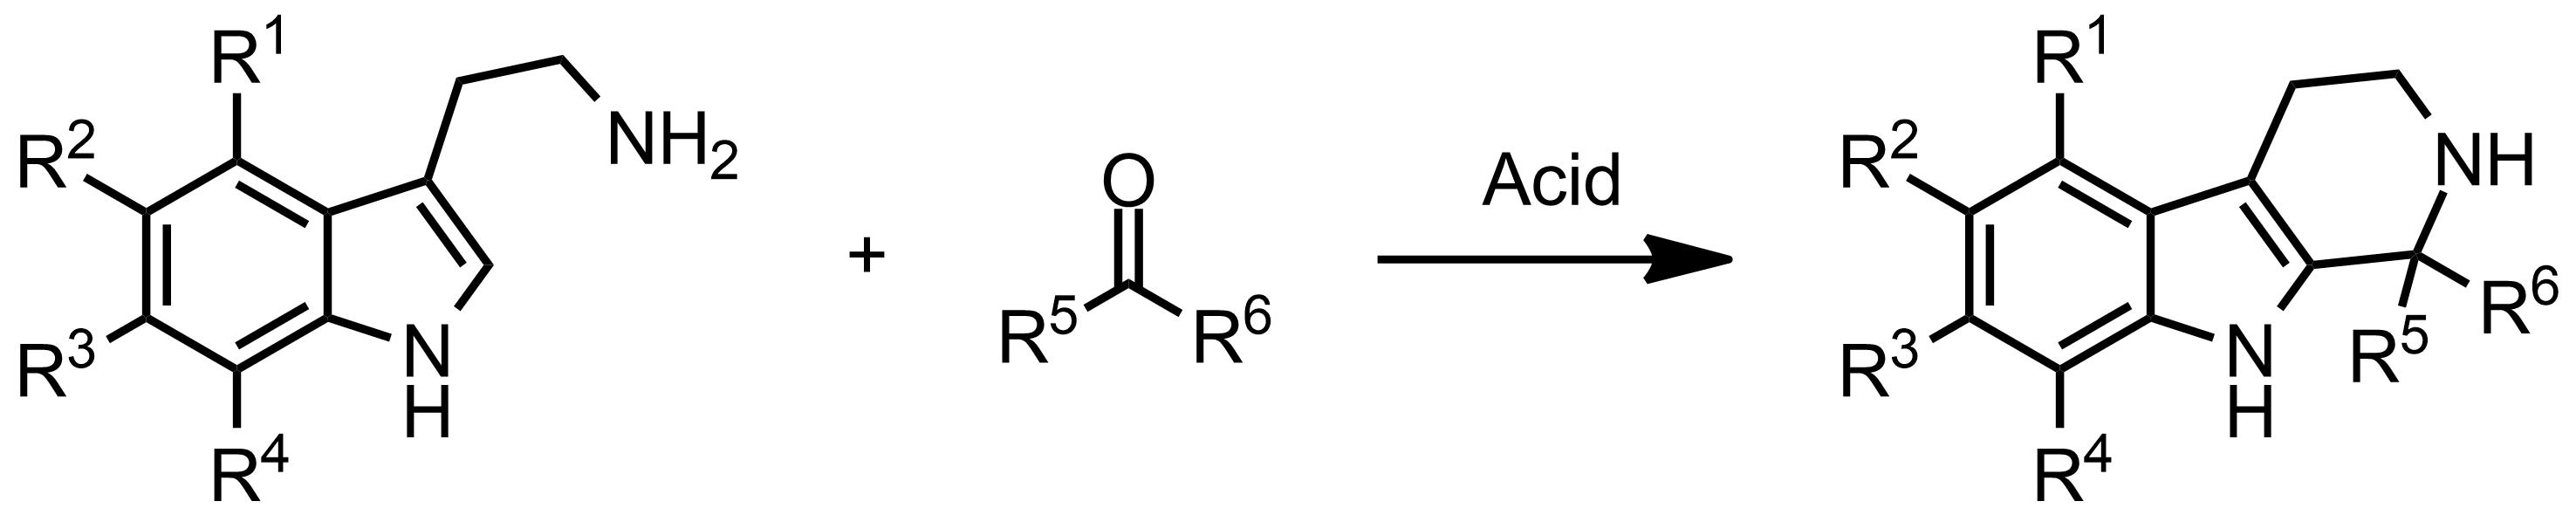 Schematic representation of the Pictet-Spengler Reaction.